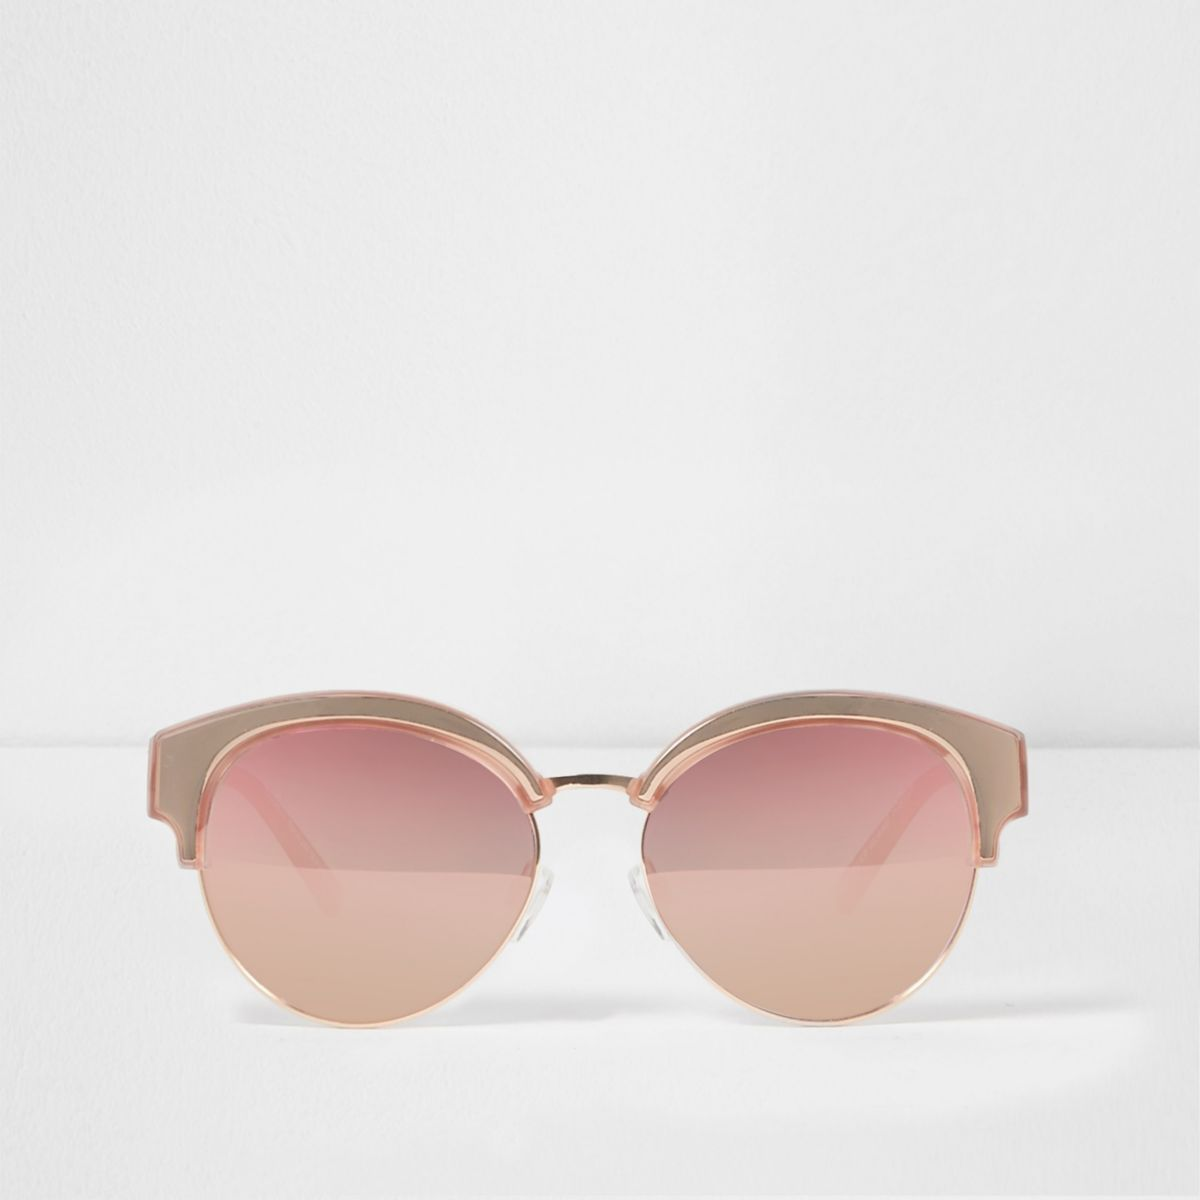 Rose gold tone mirror lens sunglasses